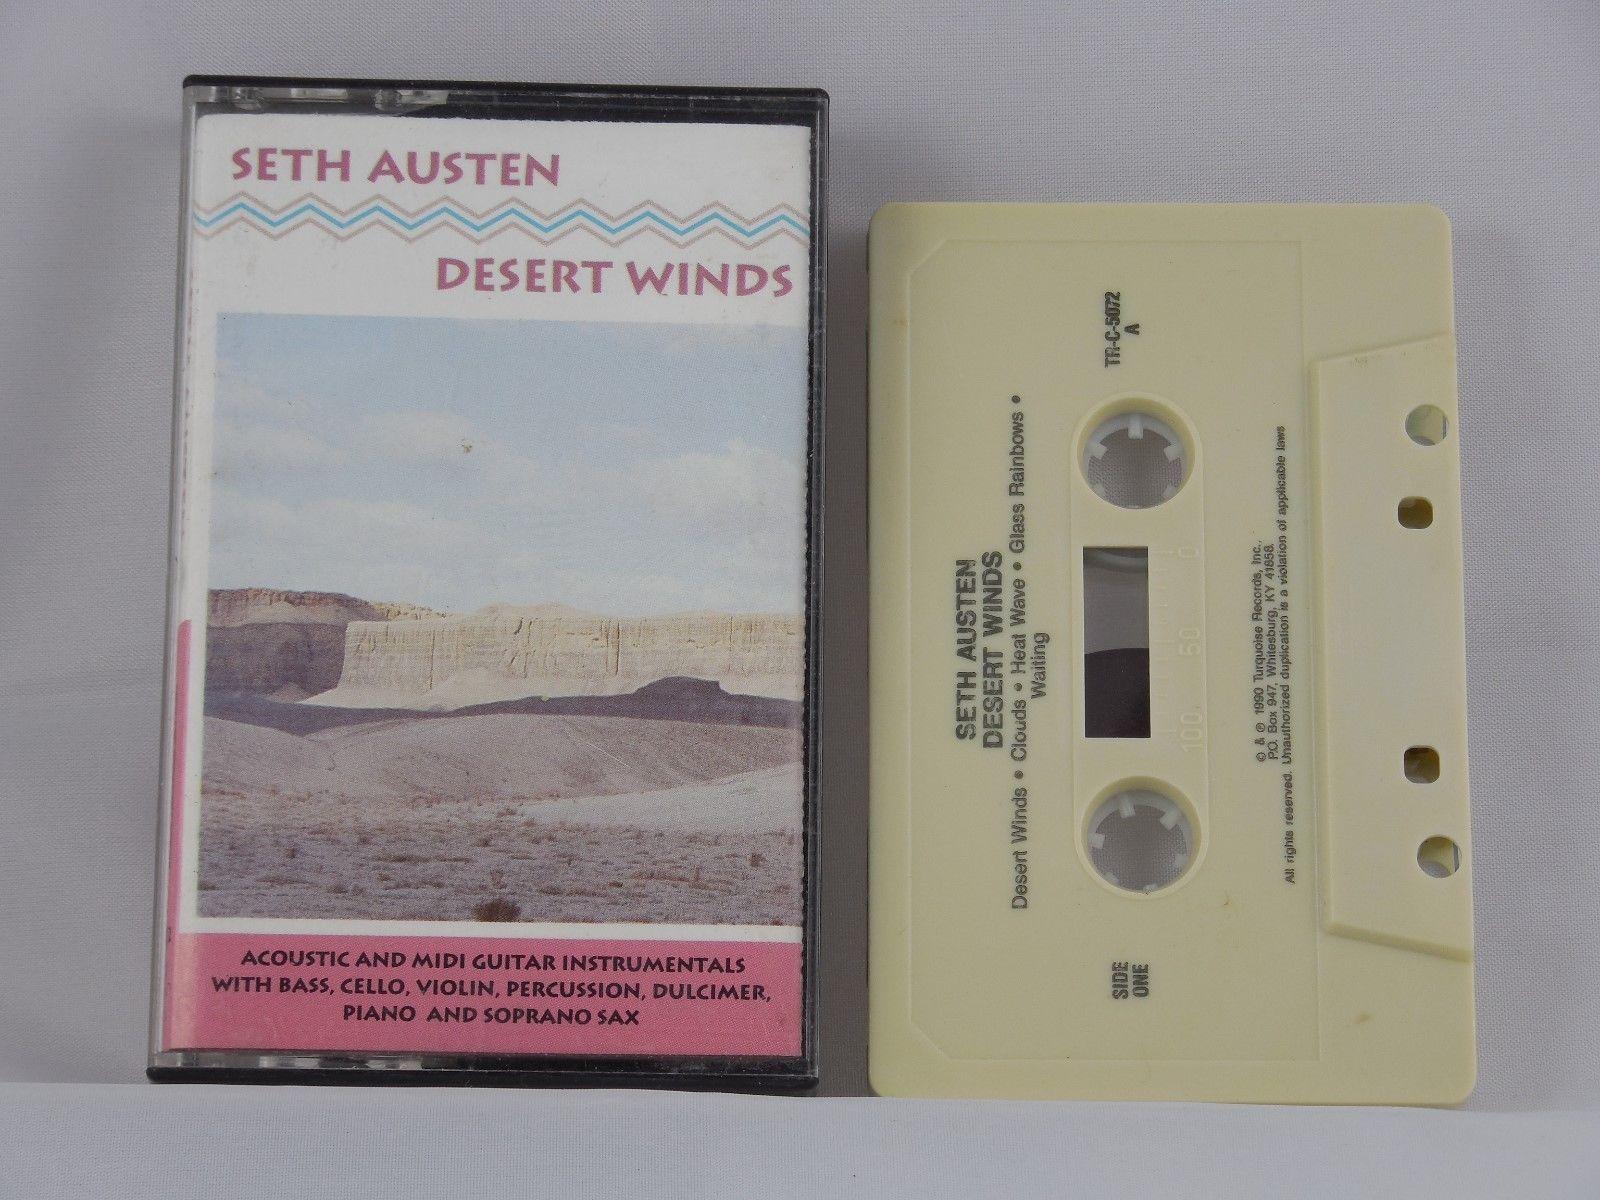 Seth Austen - Desert Winds 1990 Cassette Folk